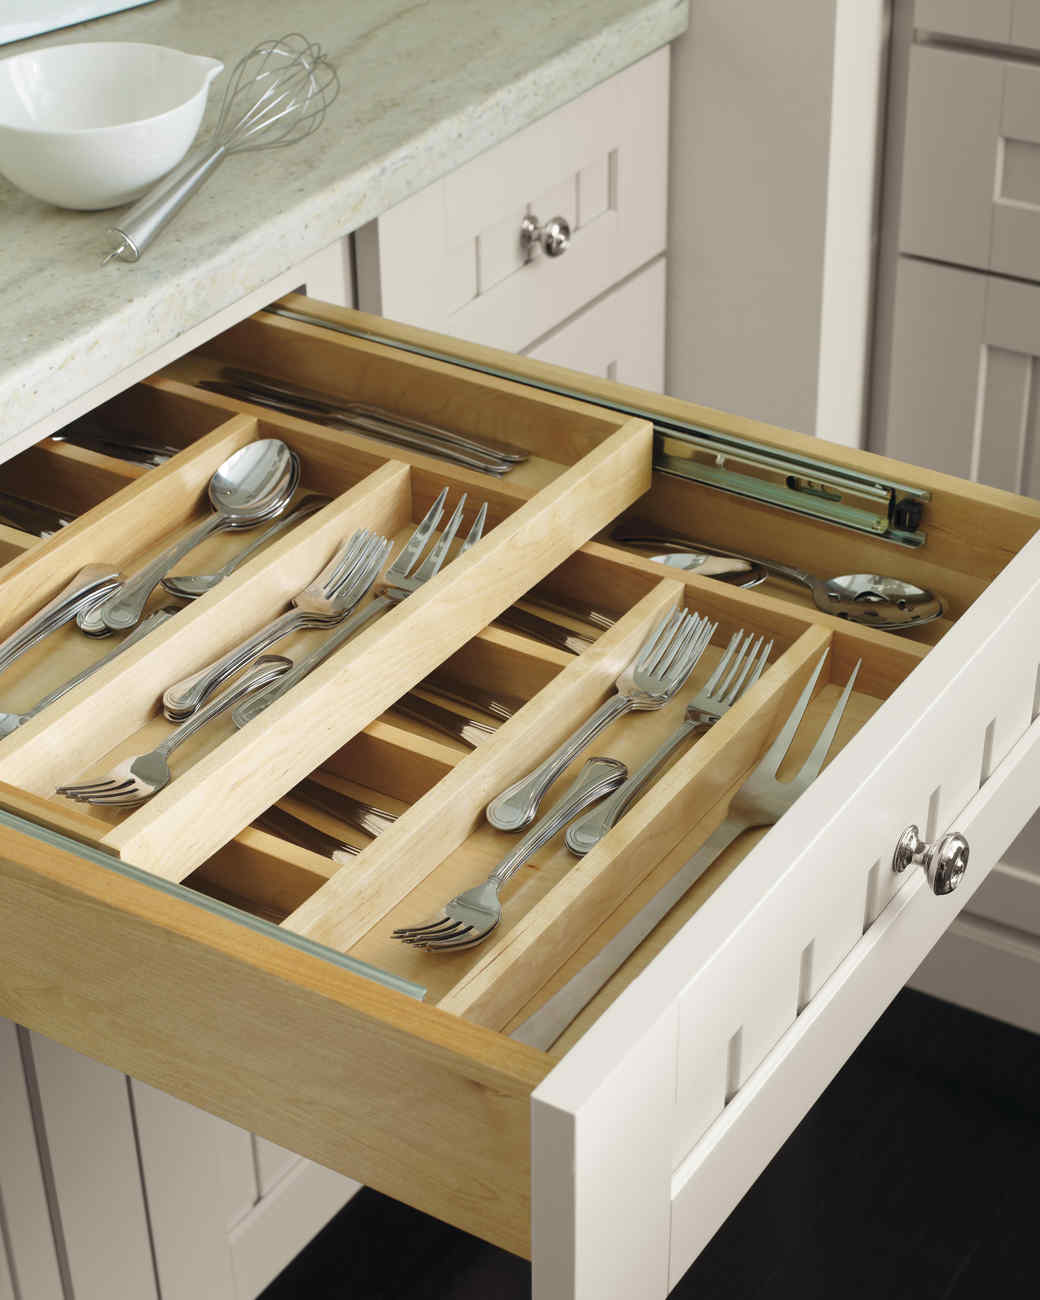 thd-host-utensildrawer-0315.jpg